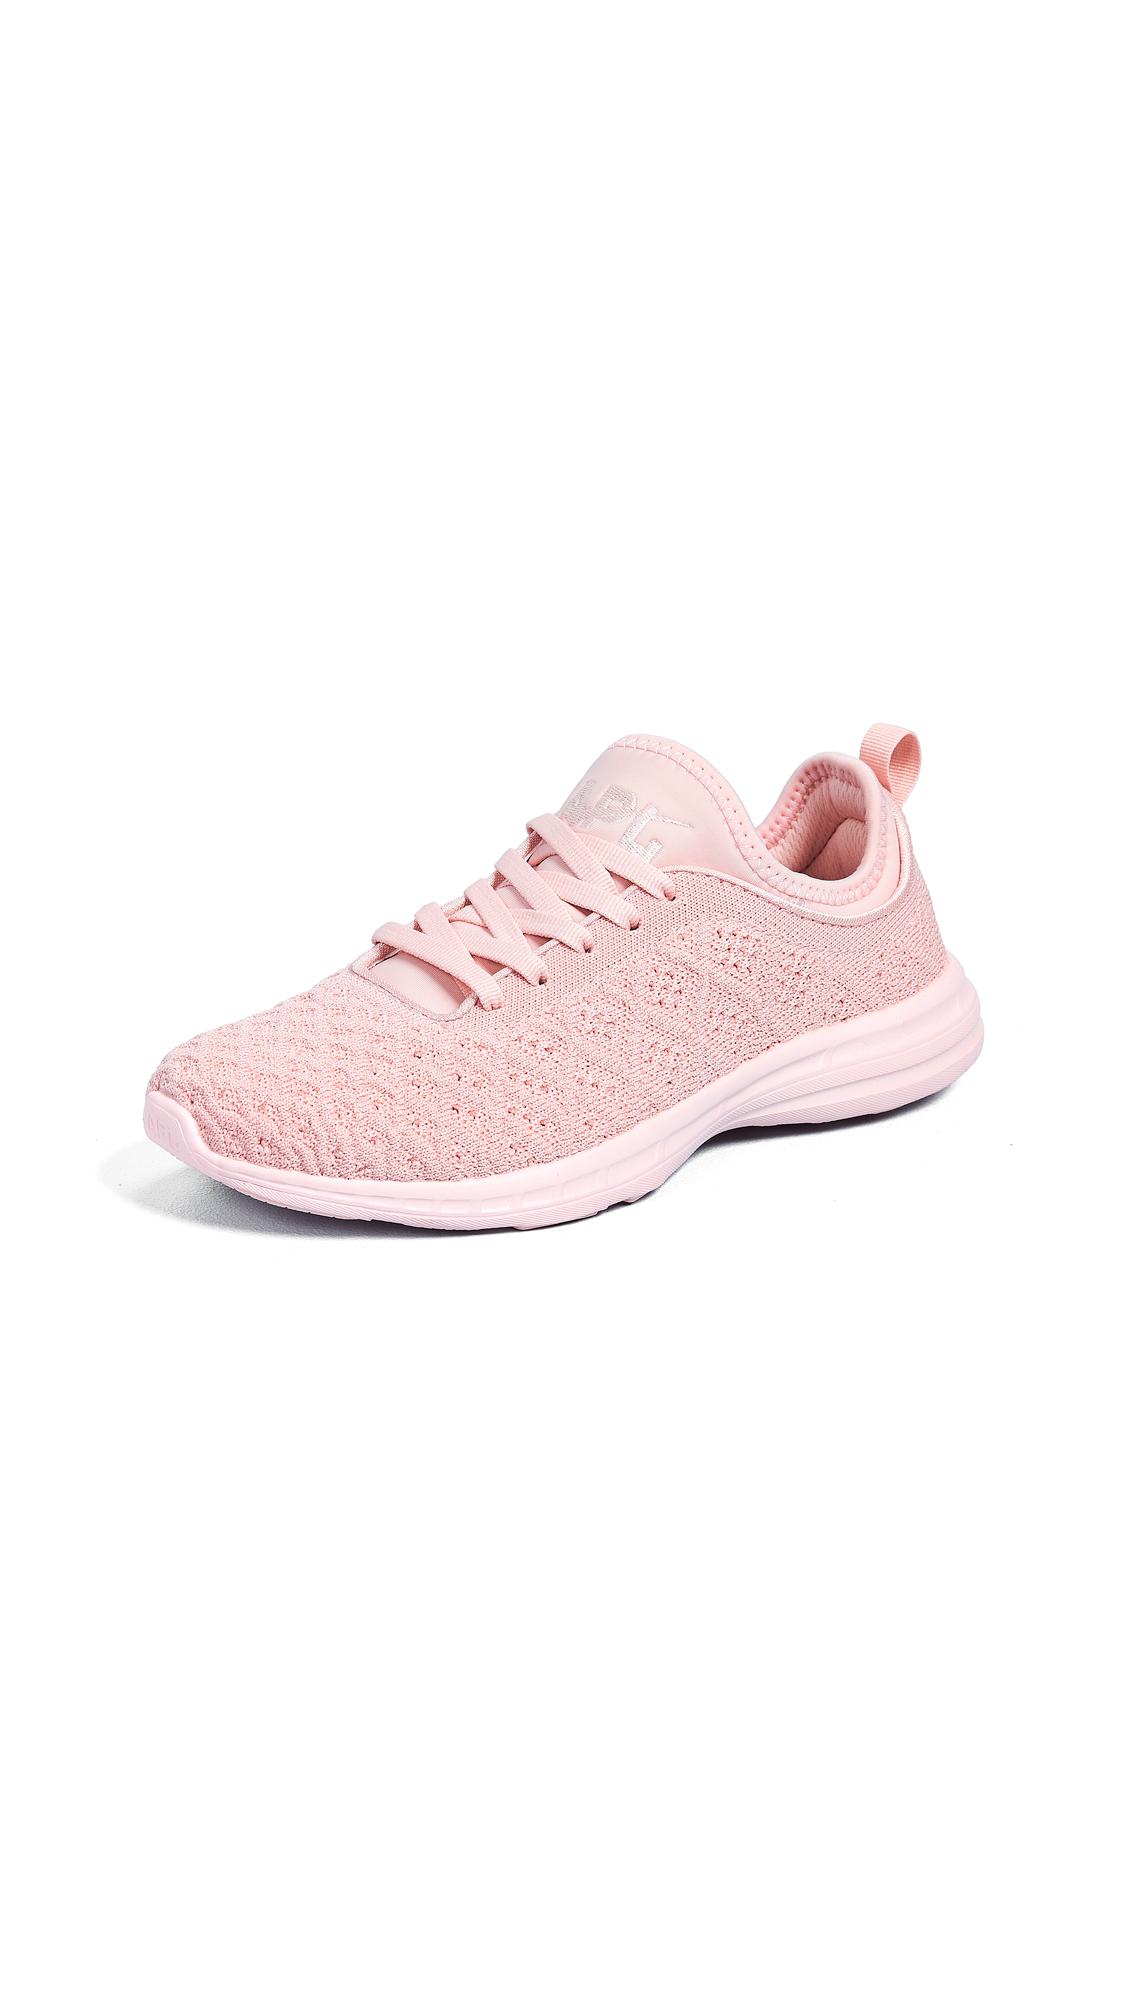 APL: Athletic Propulsion Labs TechLoom Phantom Sneakers - Gossamer Pink